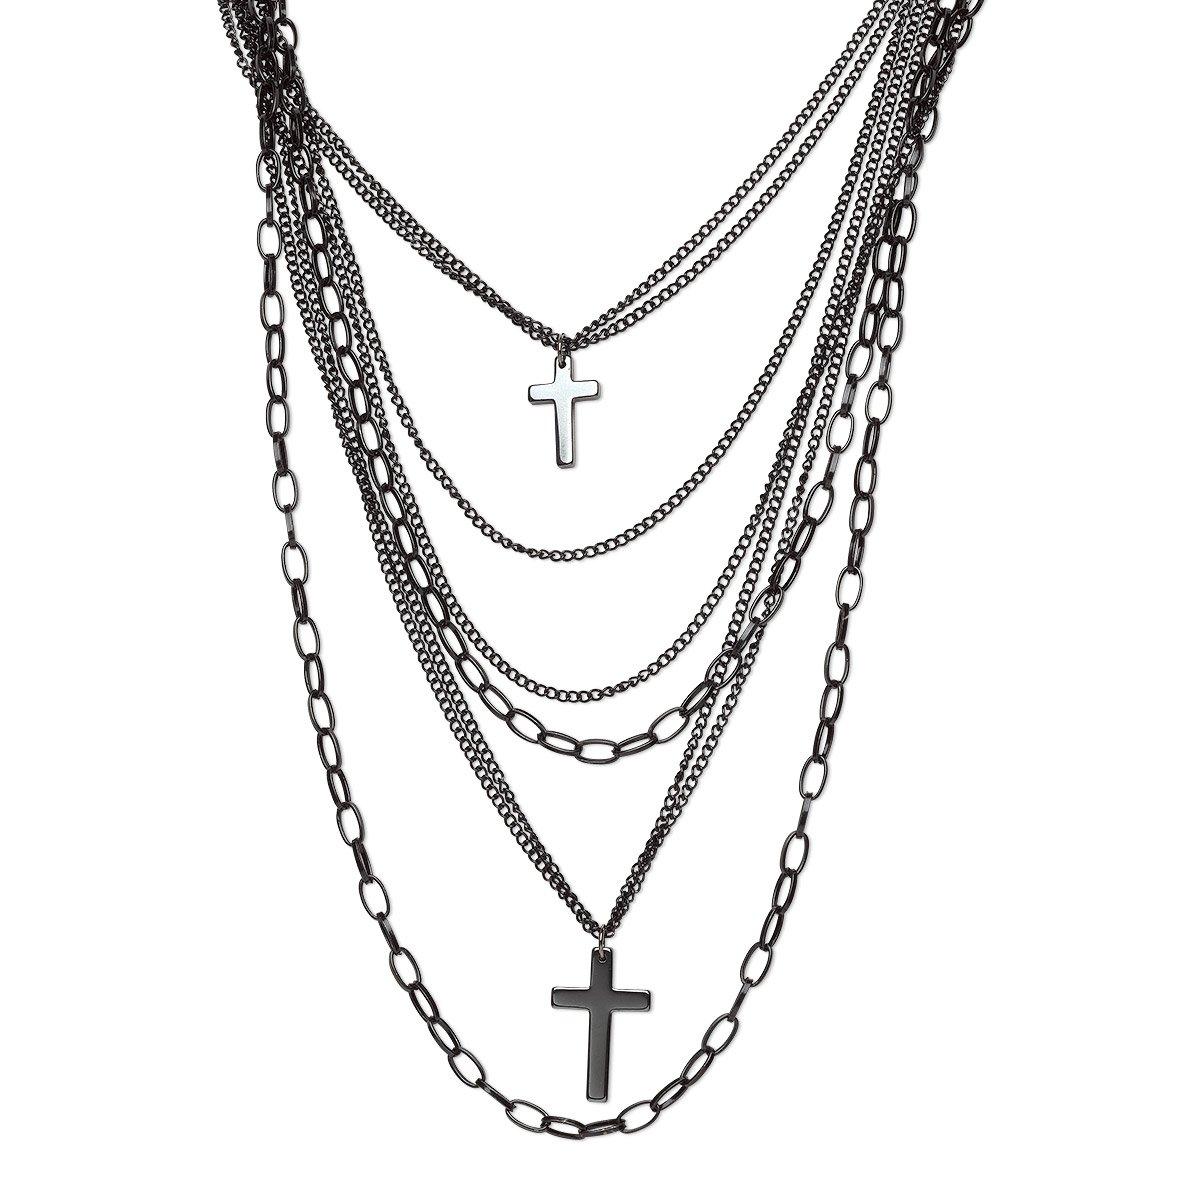 Multi Strand Black Gunmetal Plated Steel Drape Chains and Crosses 80's Gothic Punk Retro Fashion Necklace